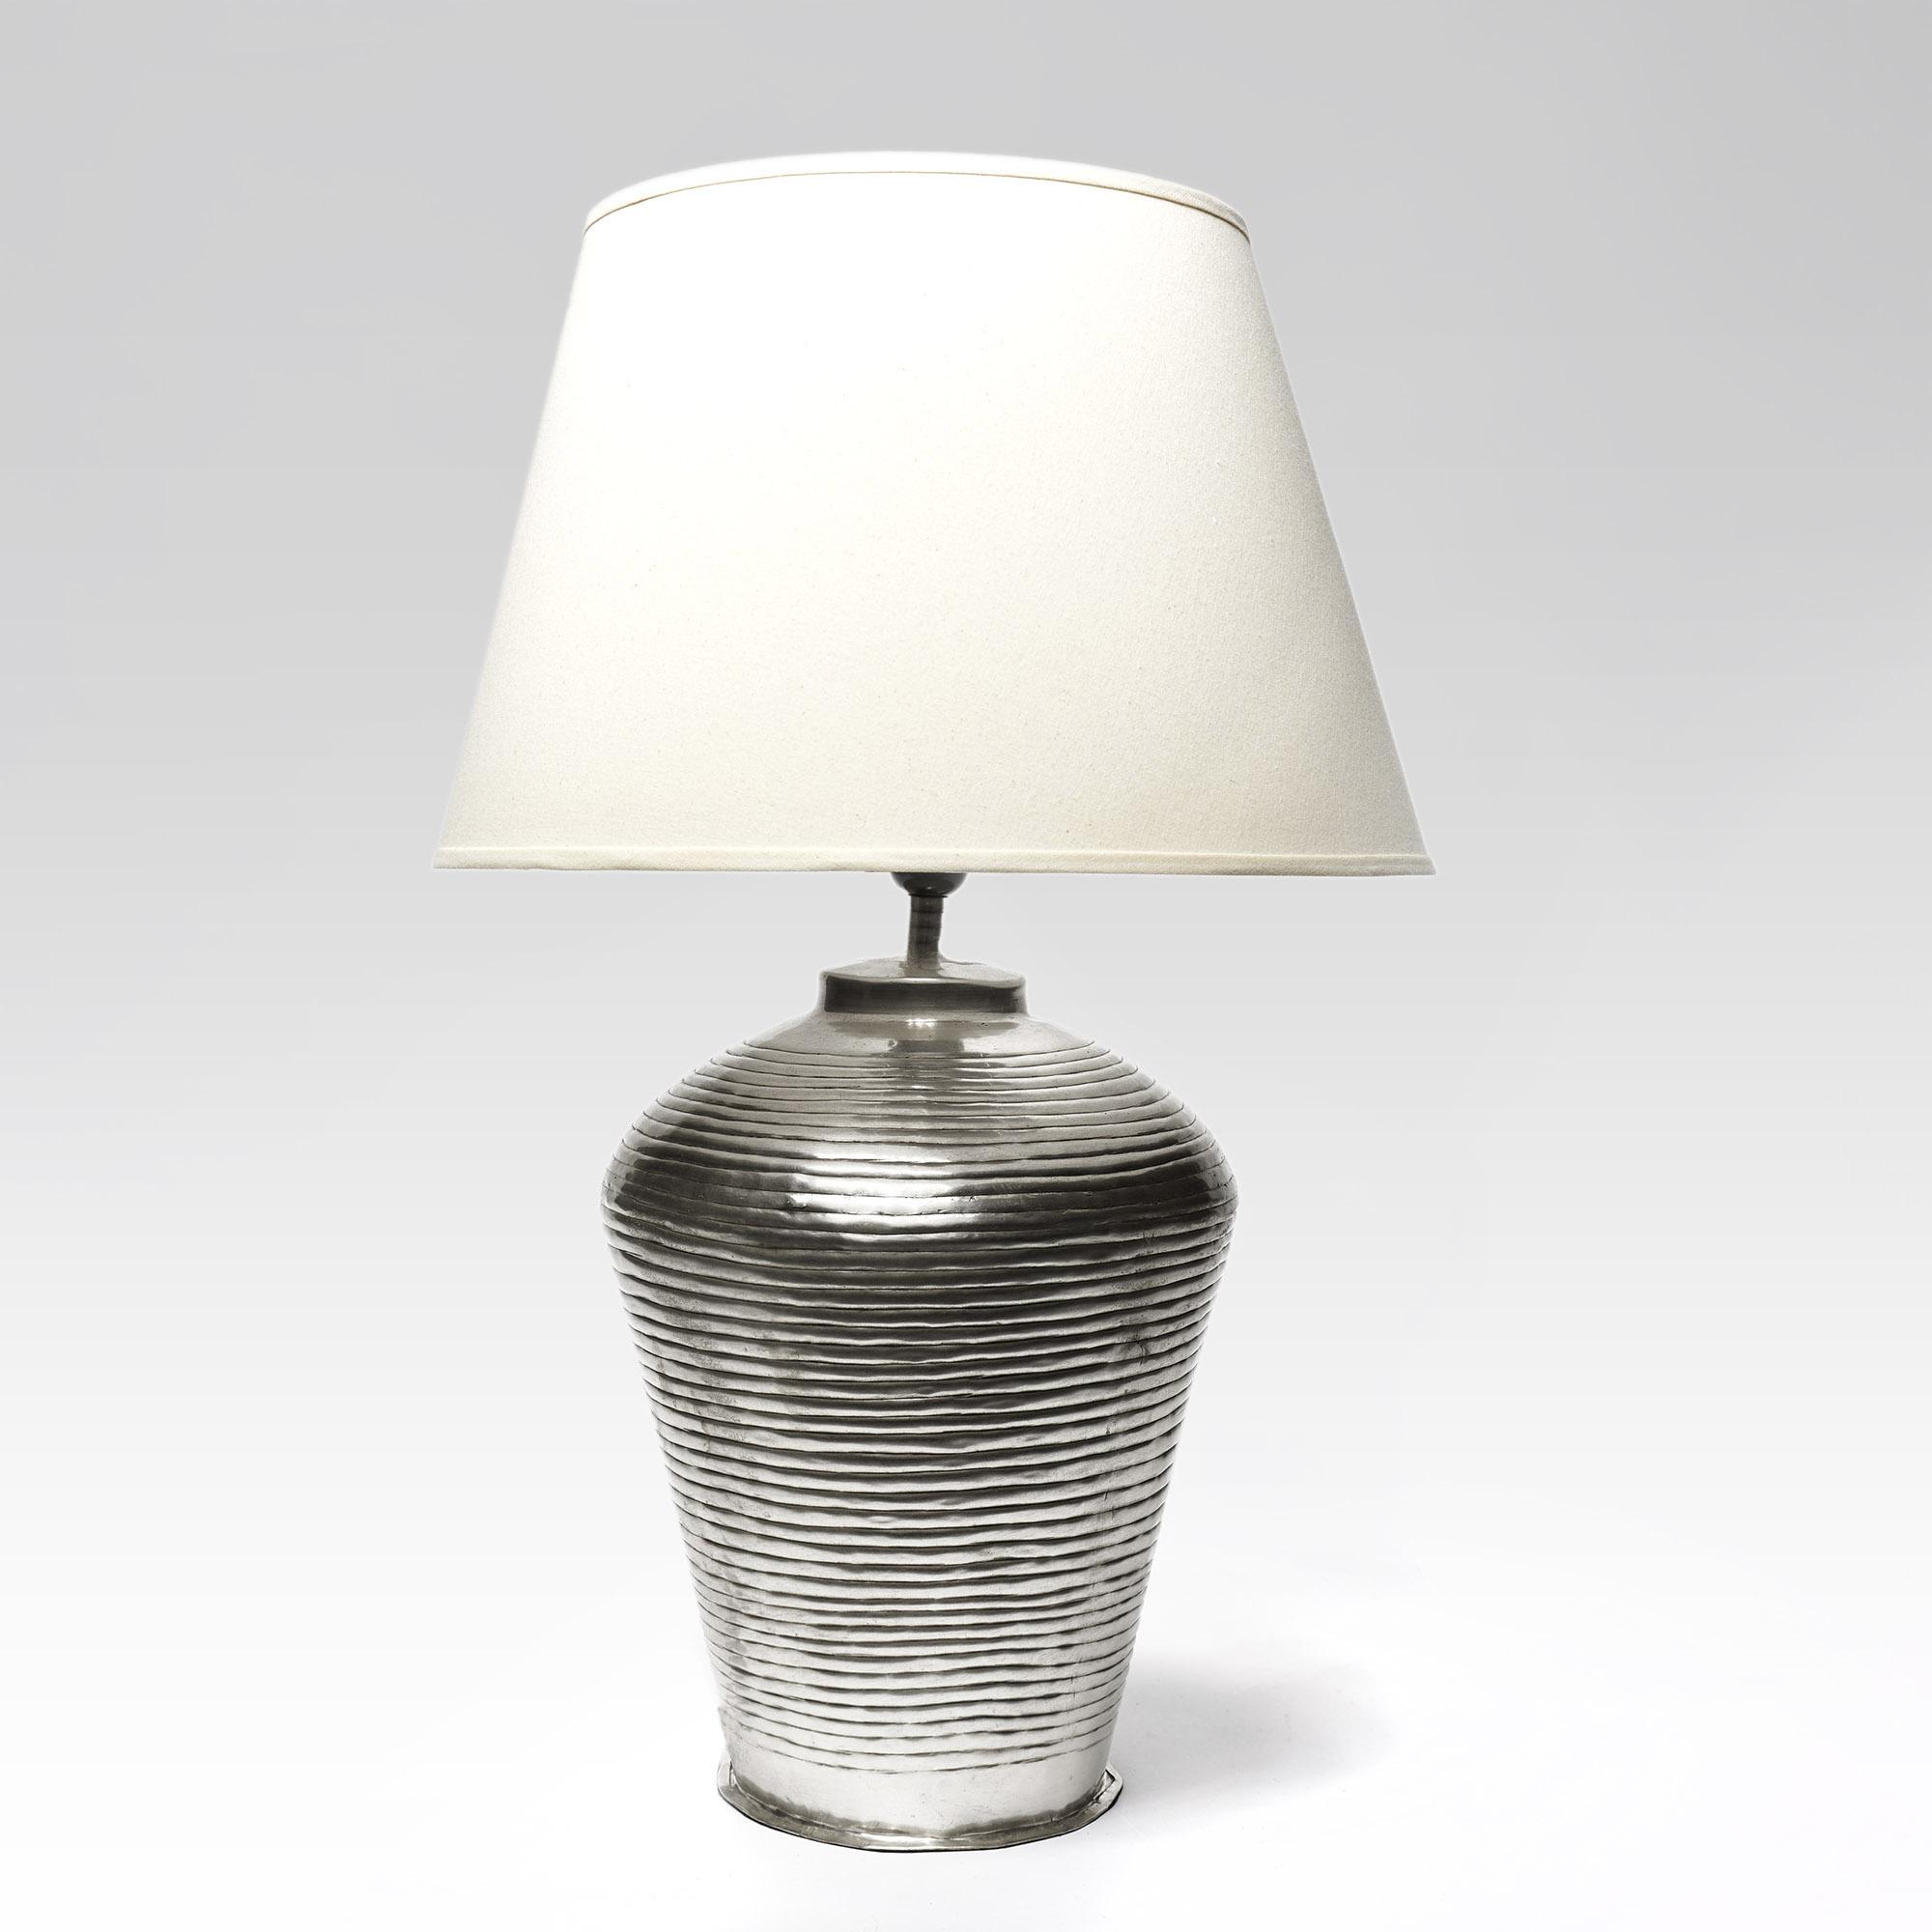 Lámpara de metal plateada con pantalla de algodón